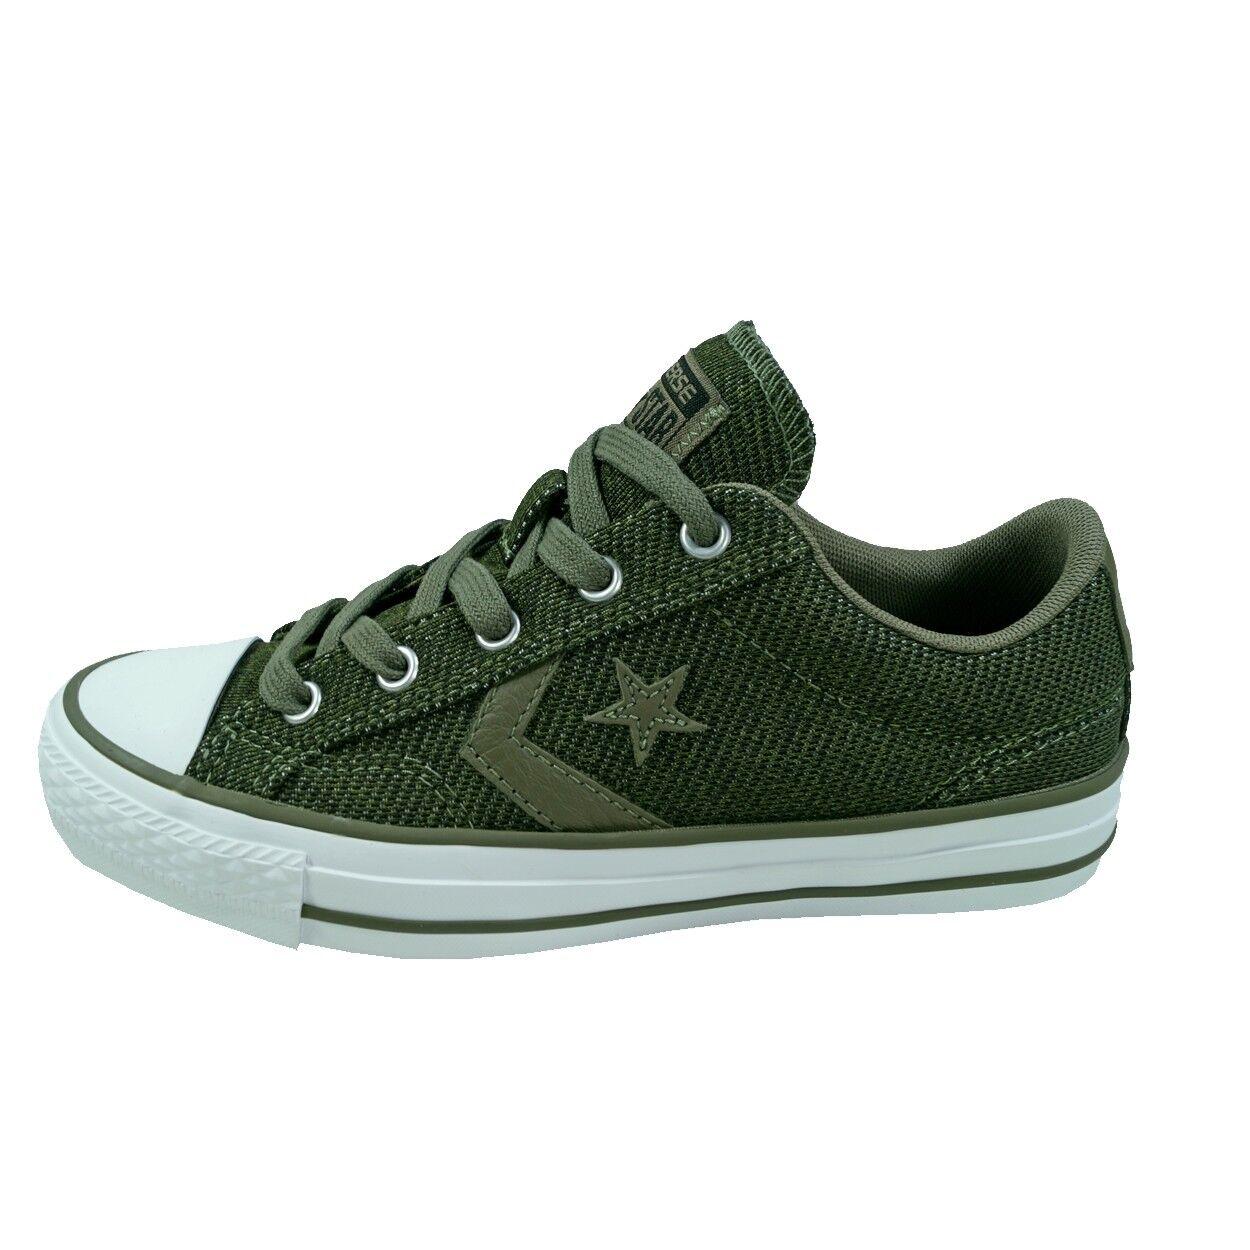 Converse Scarpe Da Donna Star Player Ox verde Tg. Tg. Tg. 41 scarpe da ginnastica Chucks Chuck 157764c 2493ca